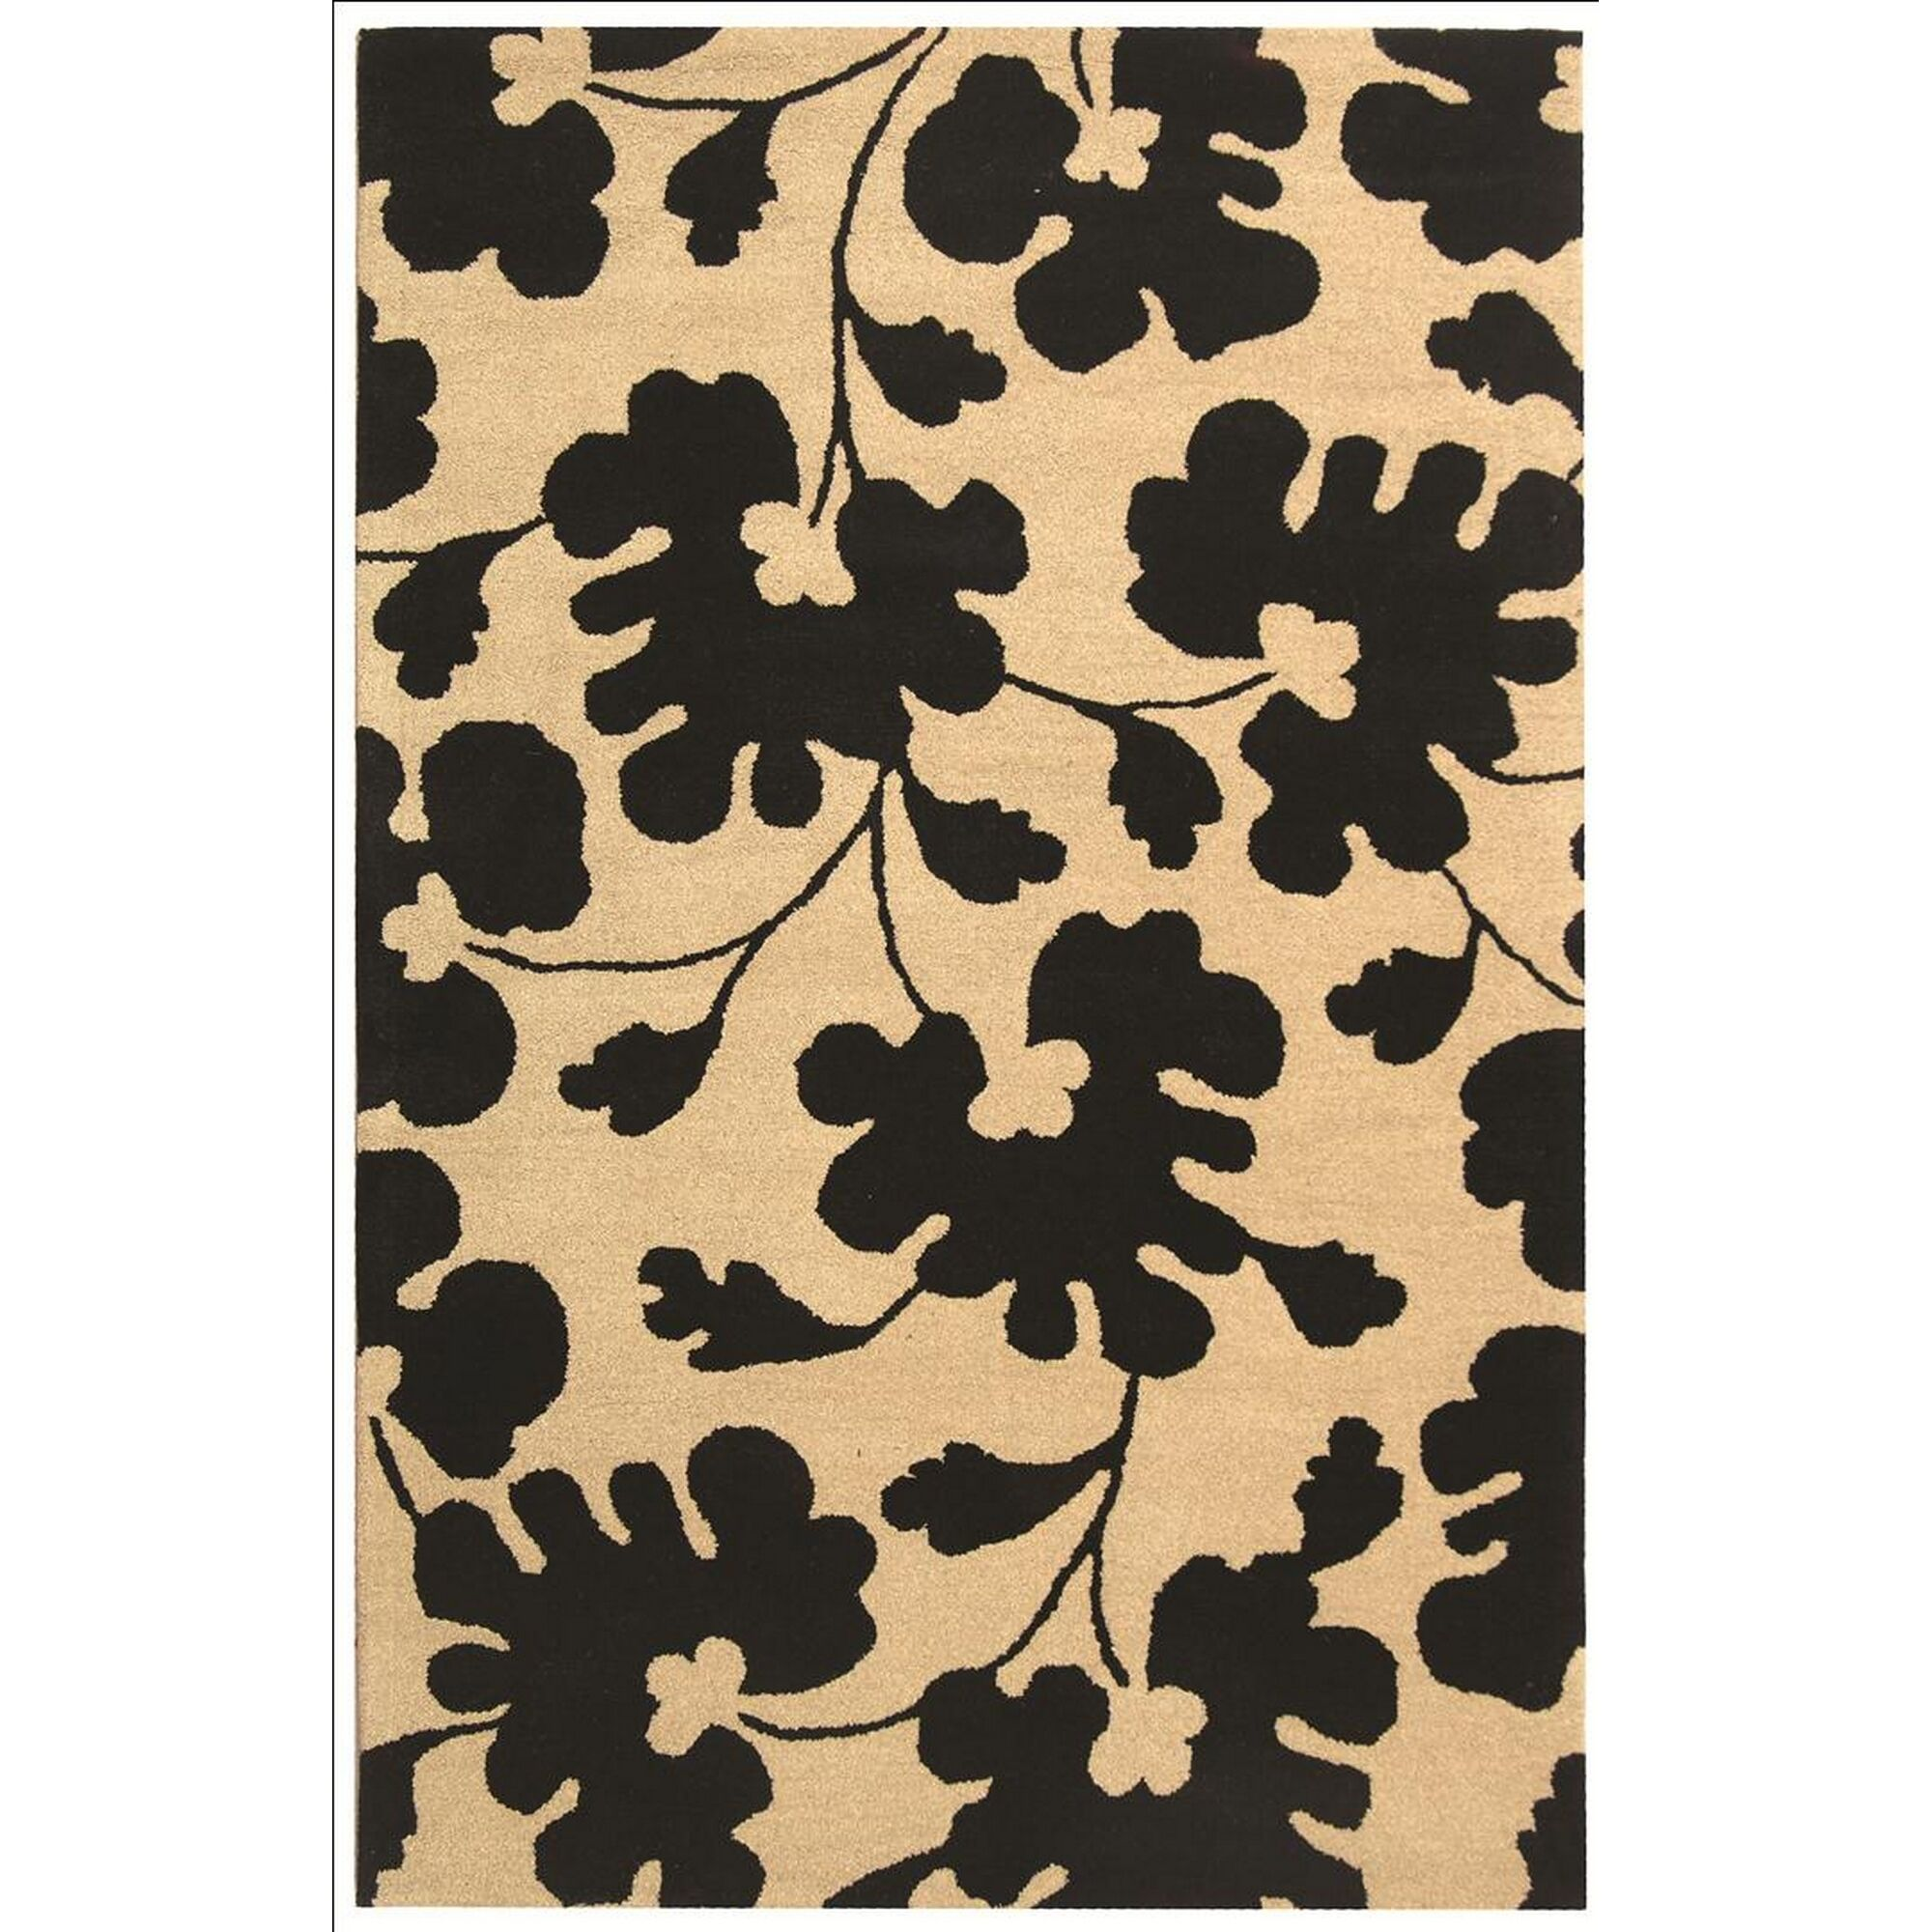 Alvan Hand-Tufted Beige/Black Area Rug Rug Size: Rectangle 5' x 8'